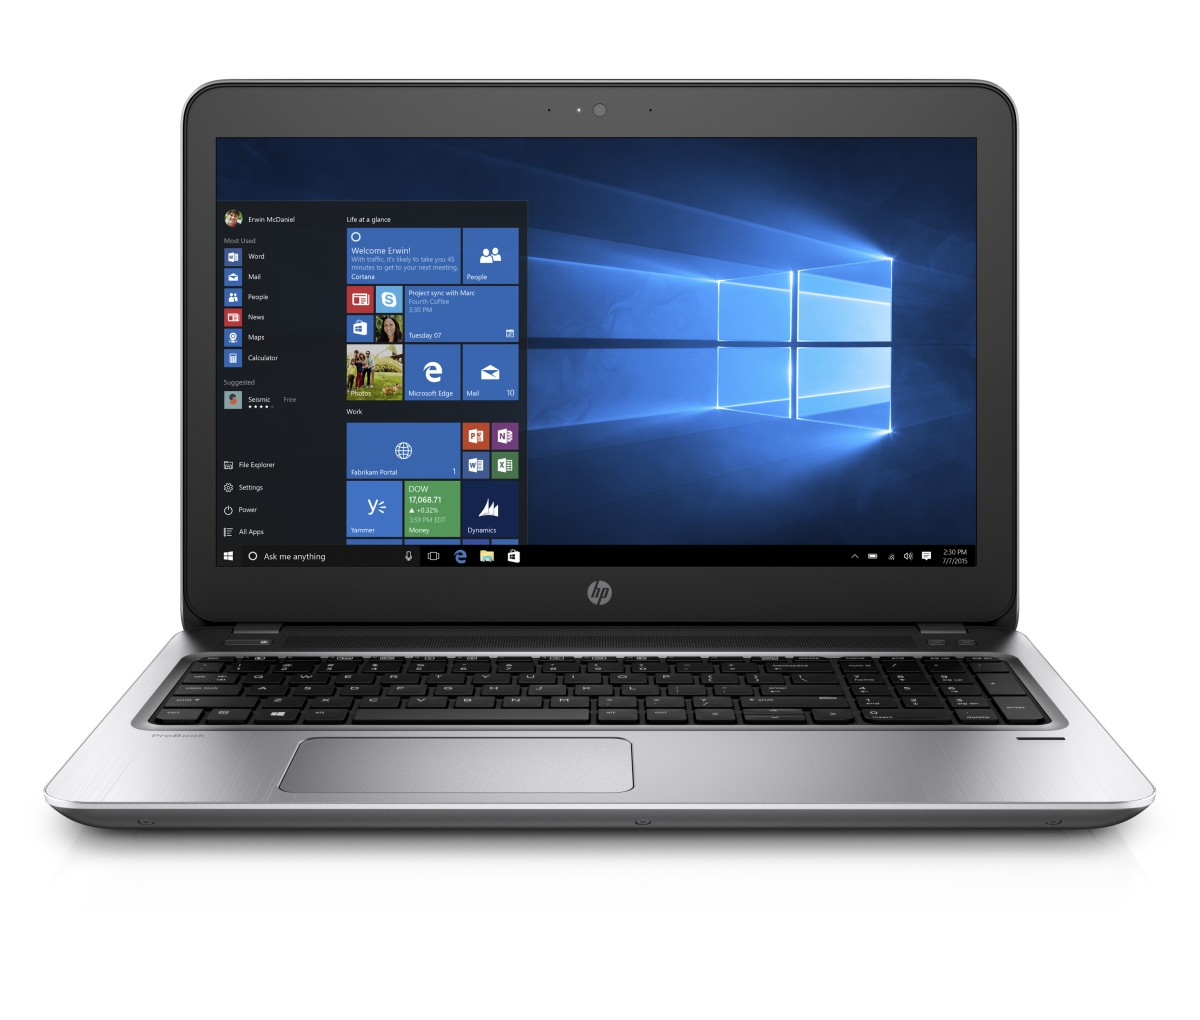 HP ProBook 450 G4 i3-7100U / 8GB / 128GB + 1TB / 15,6'' FHD / Win 10 - sea model